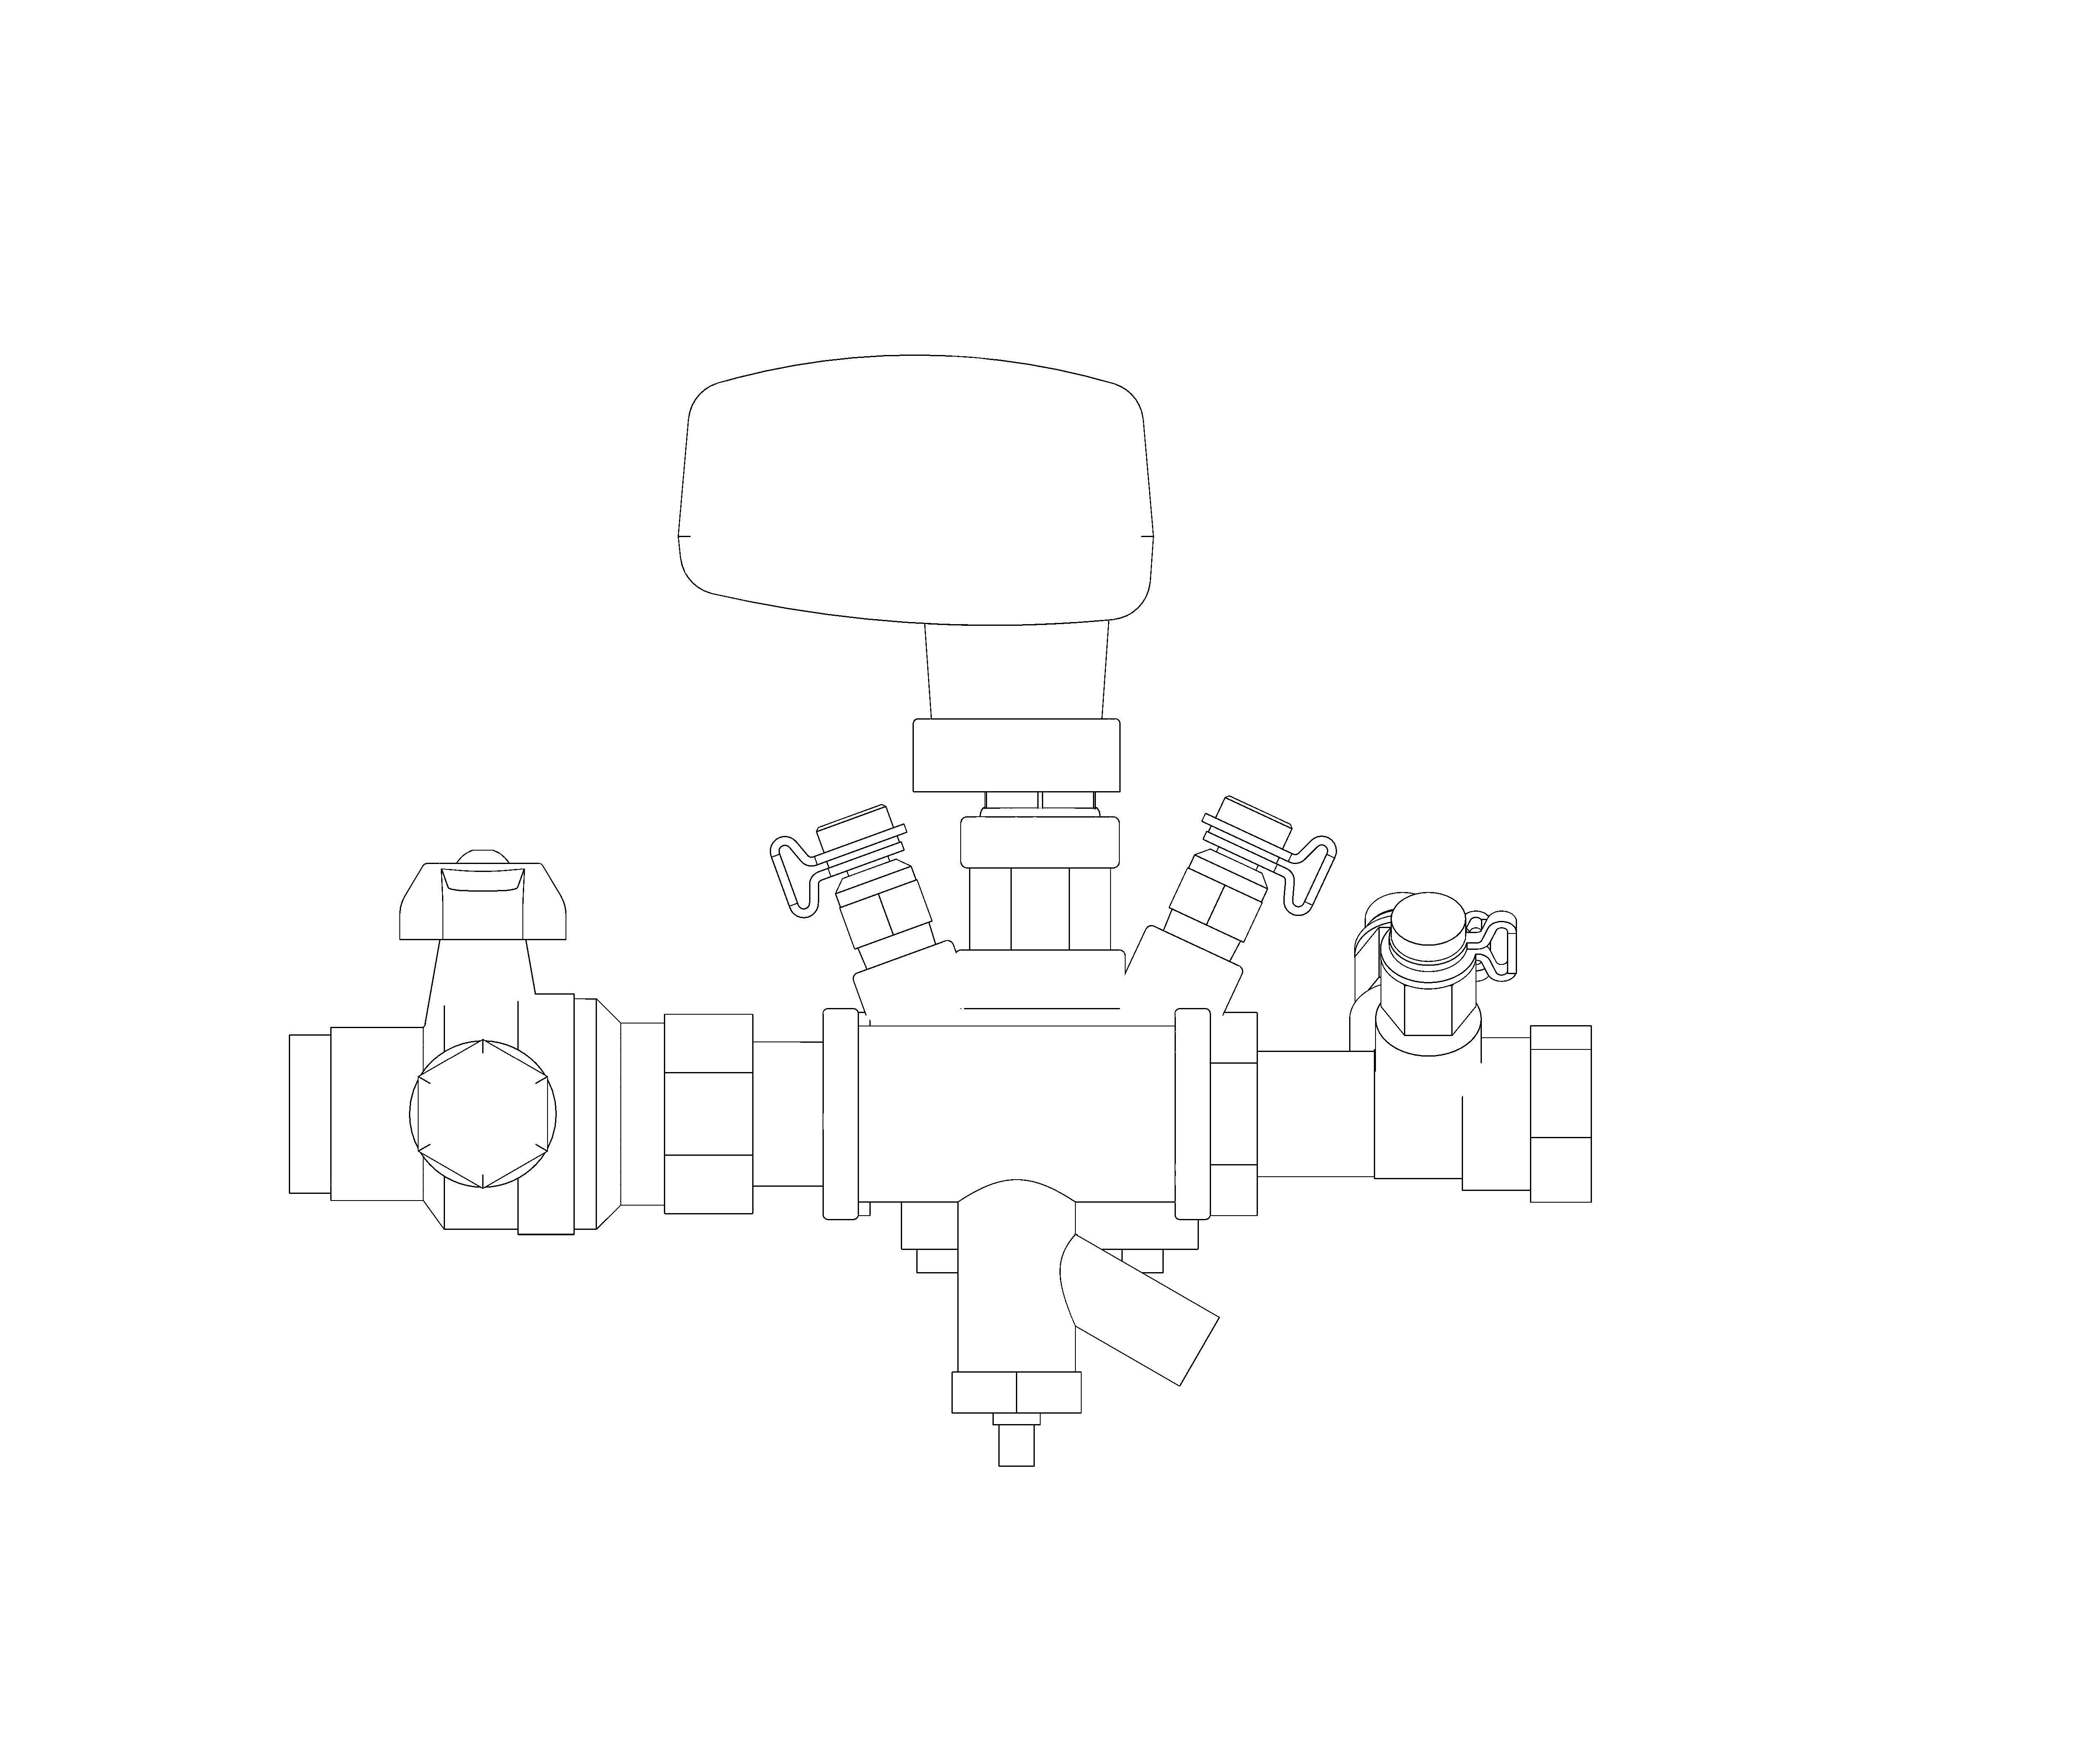 Image of Dominator Peak Pro - PICV / Strainer Drain / FMD - Z9701PF